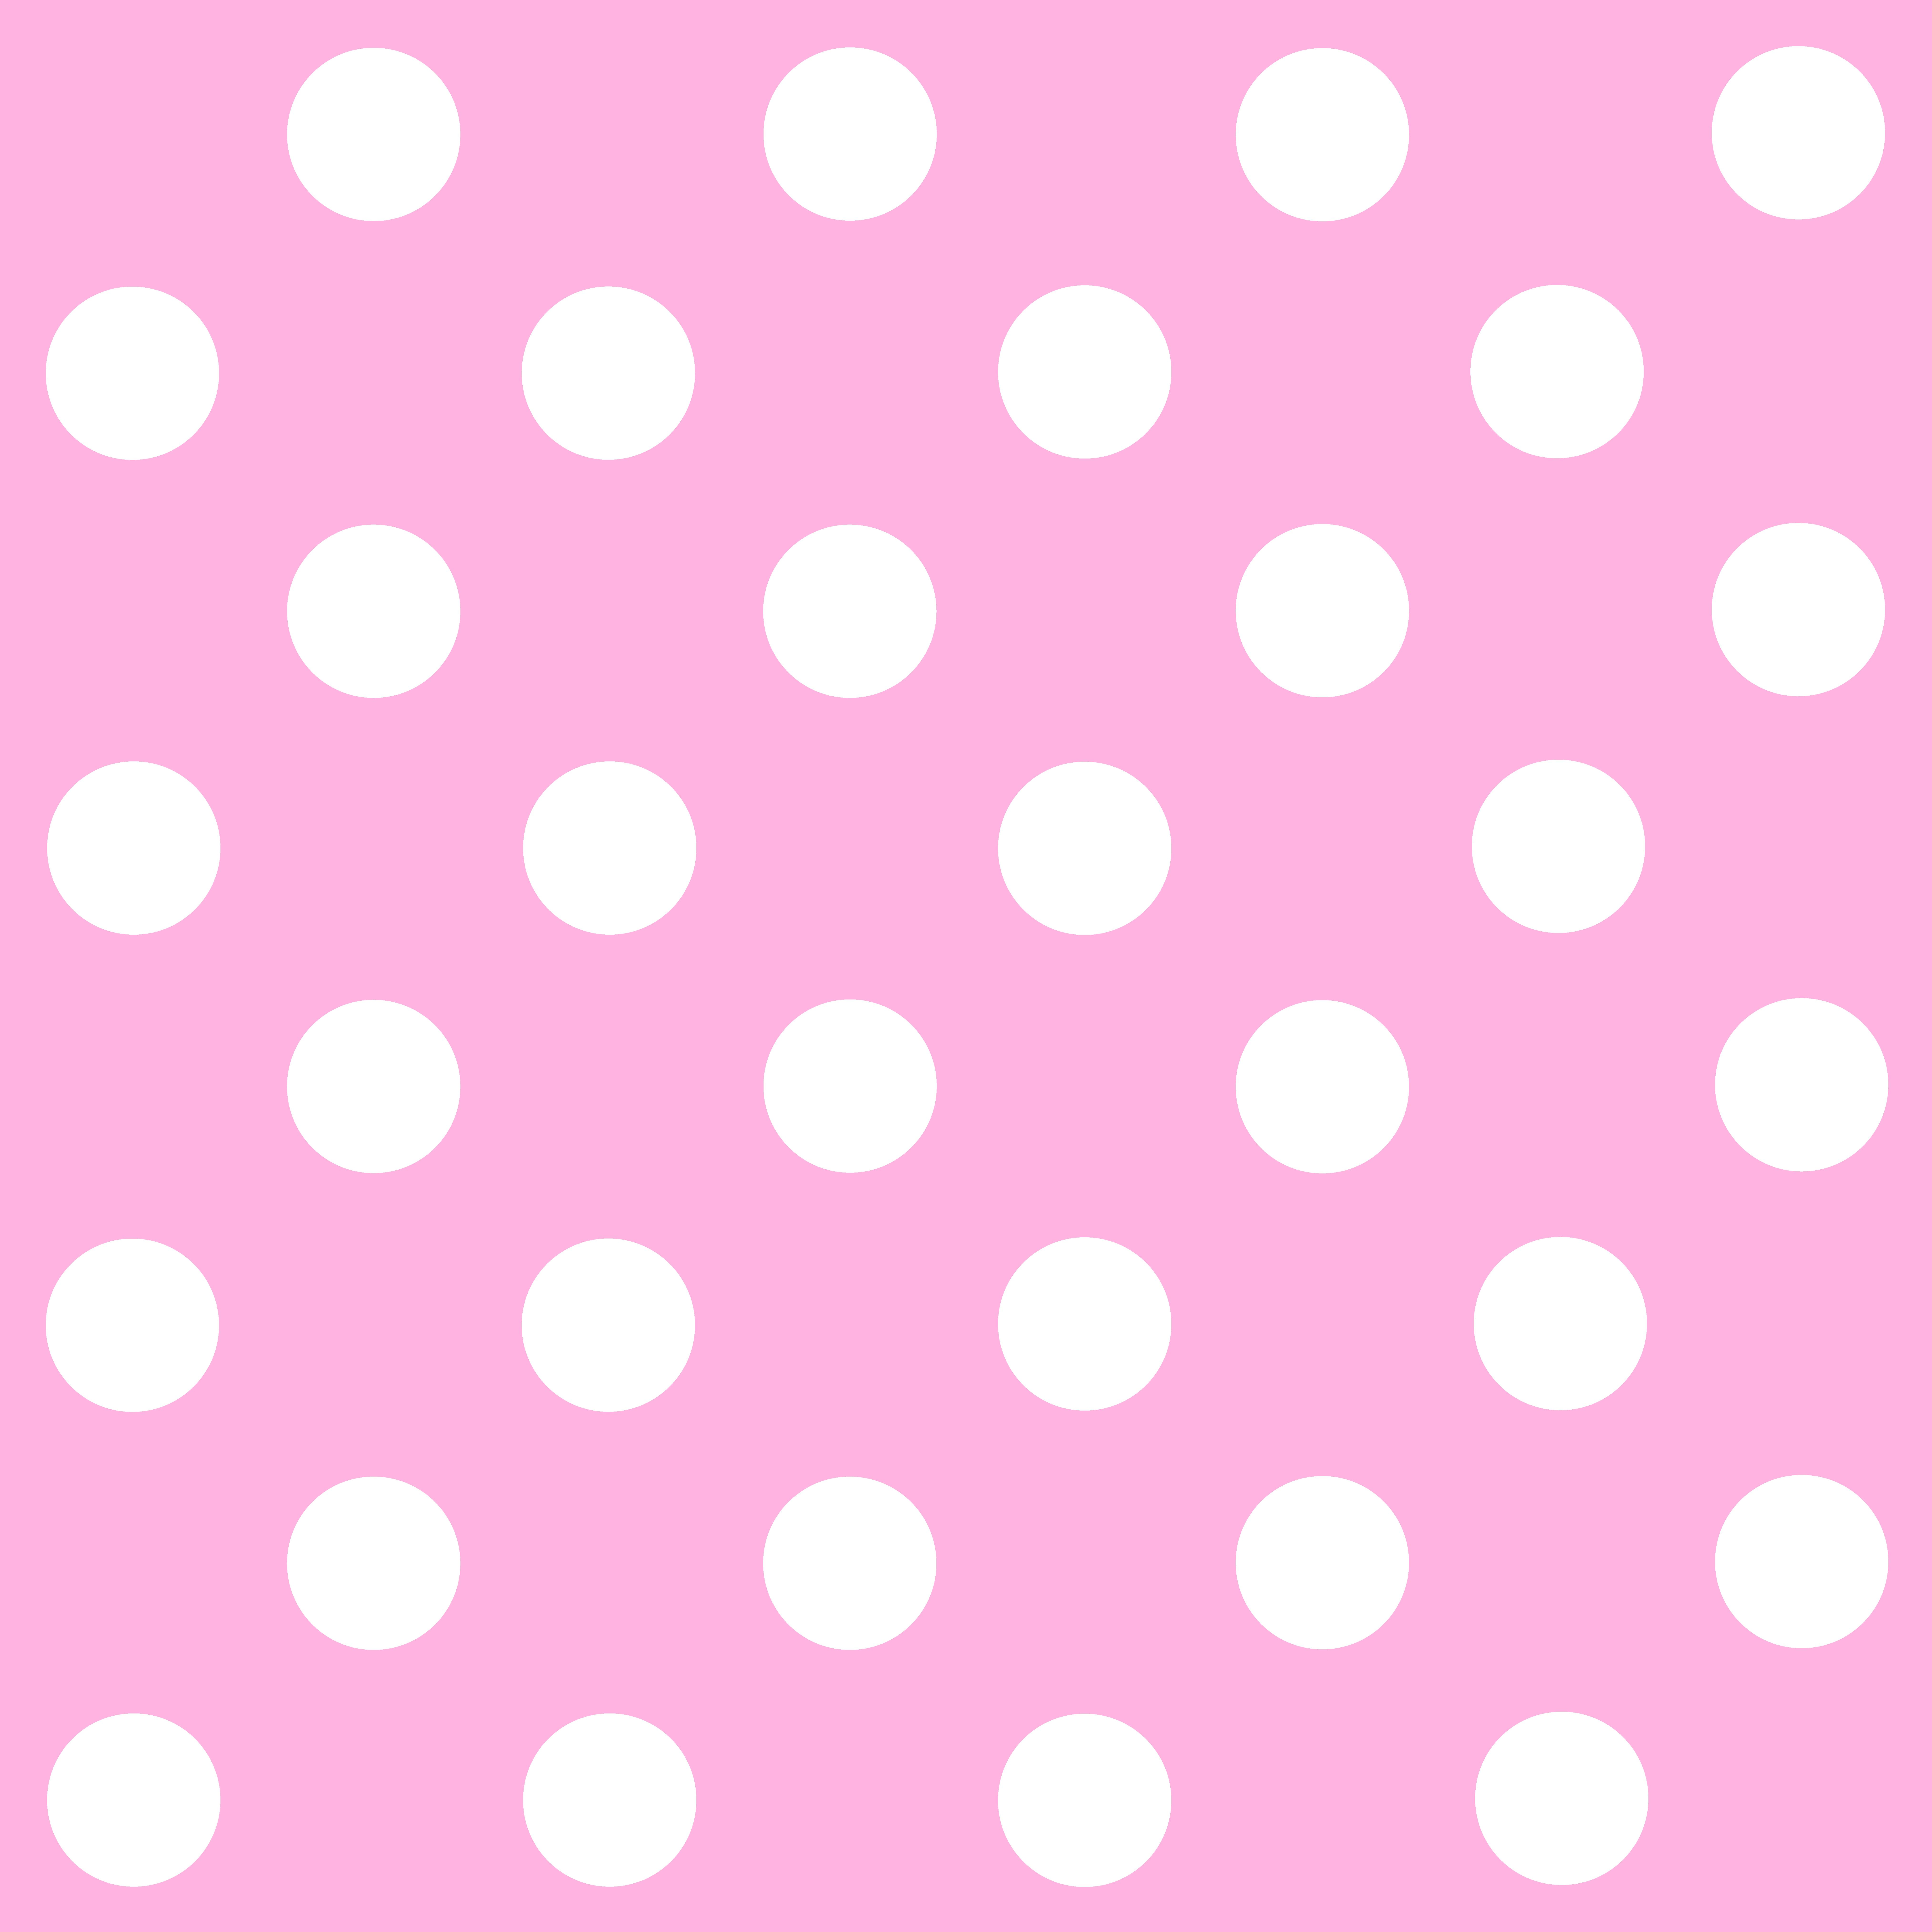 black and white and pink polka dot background wwwimgkid